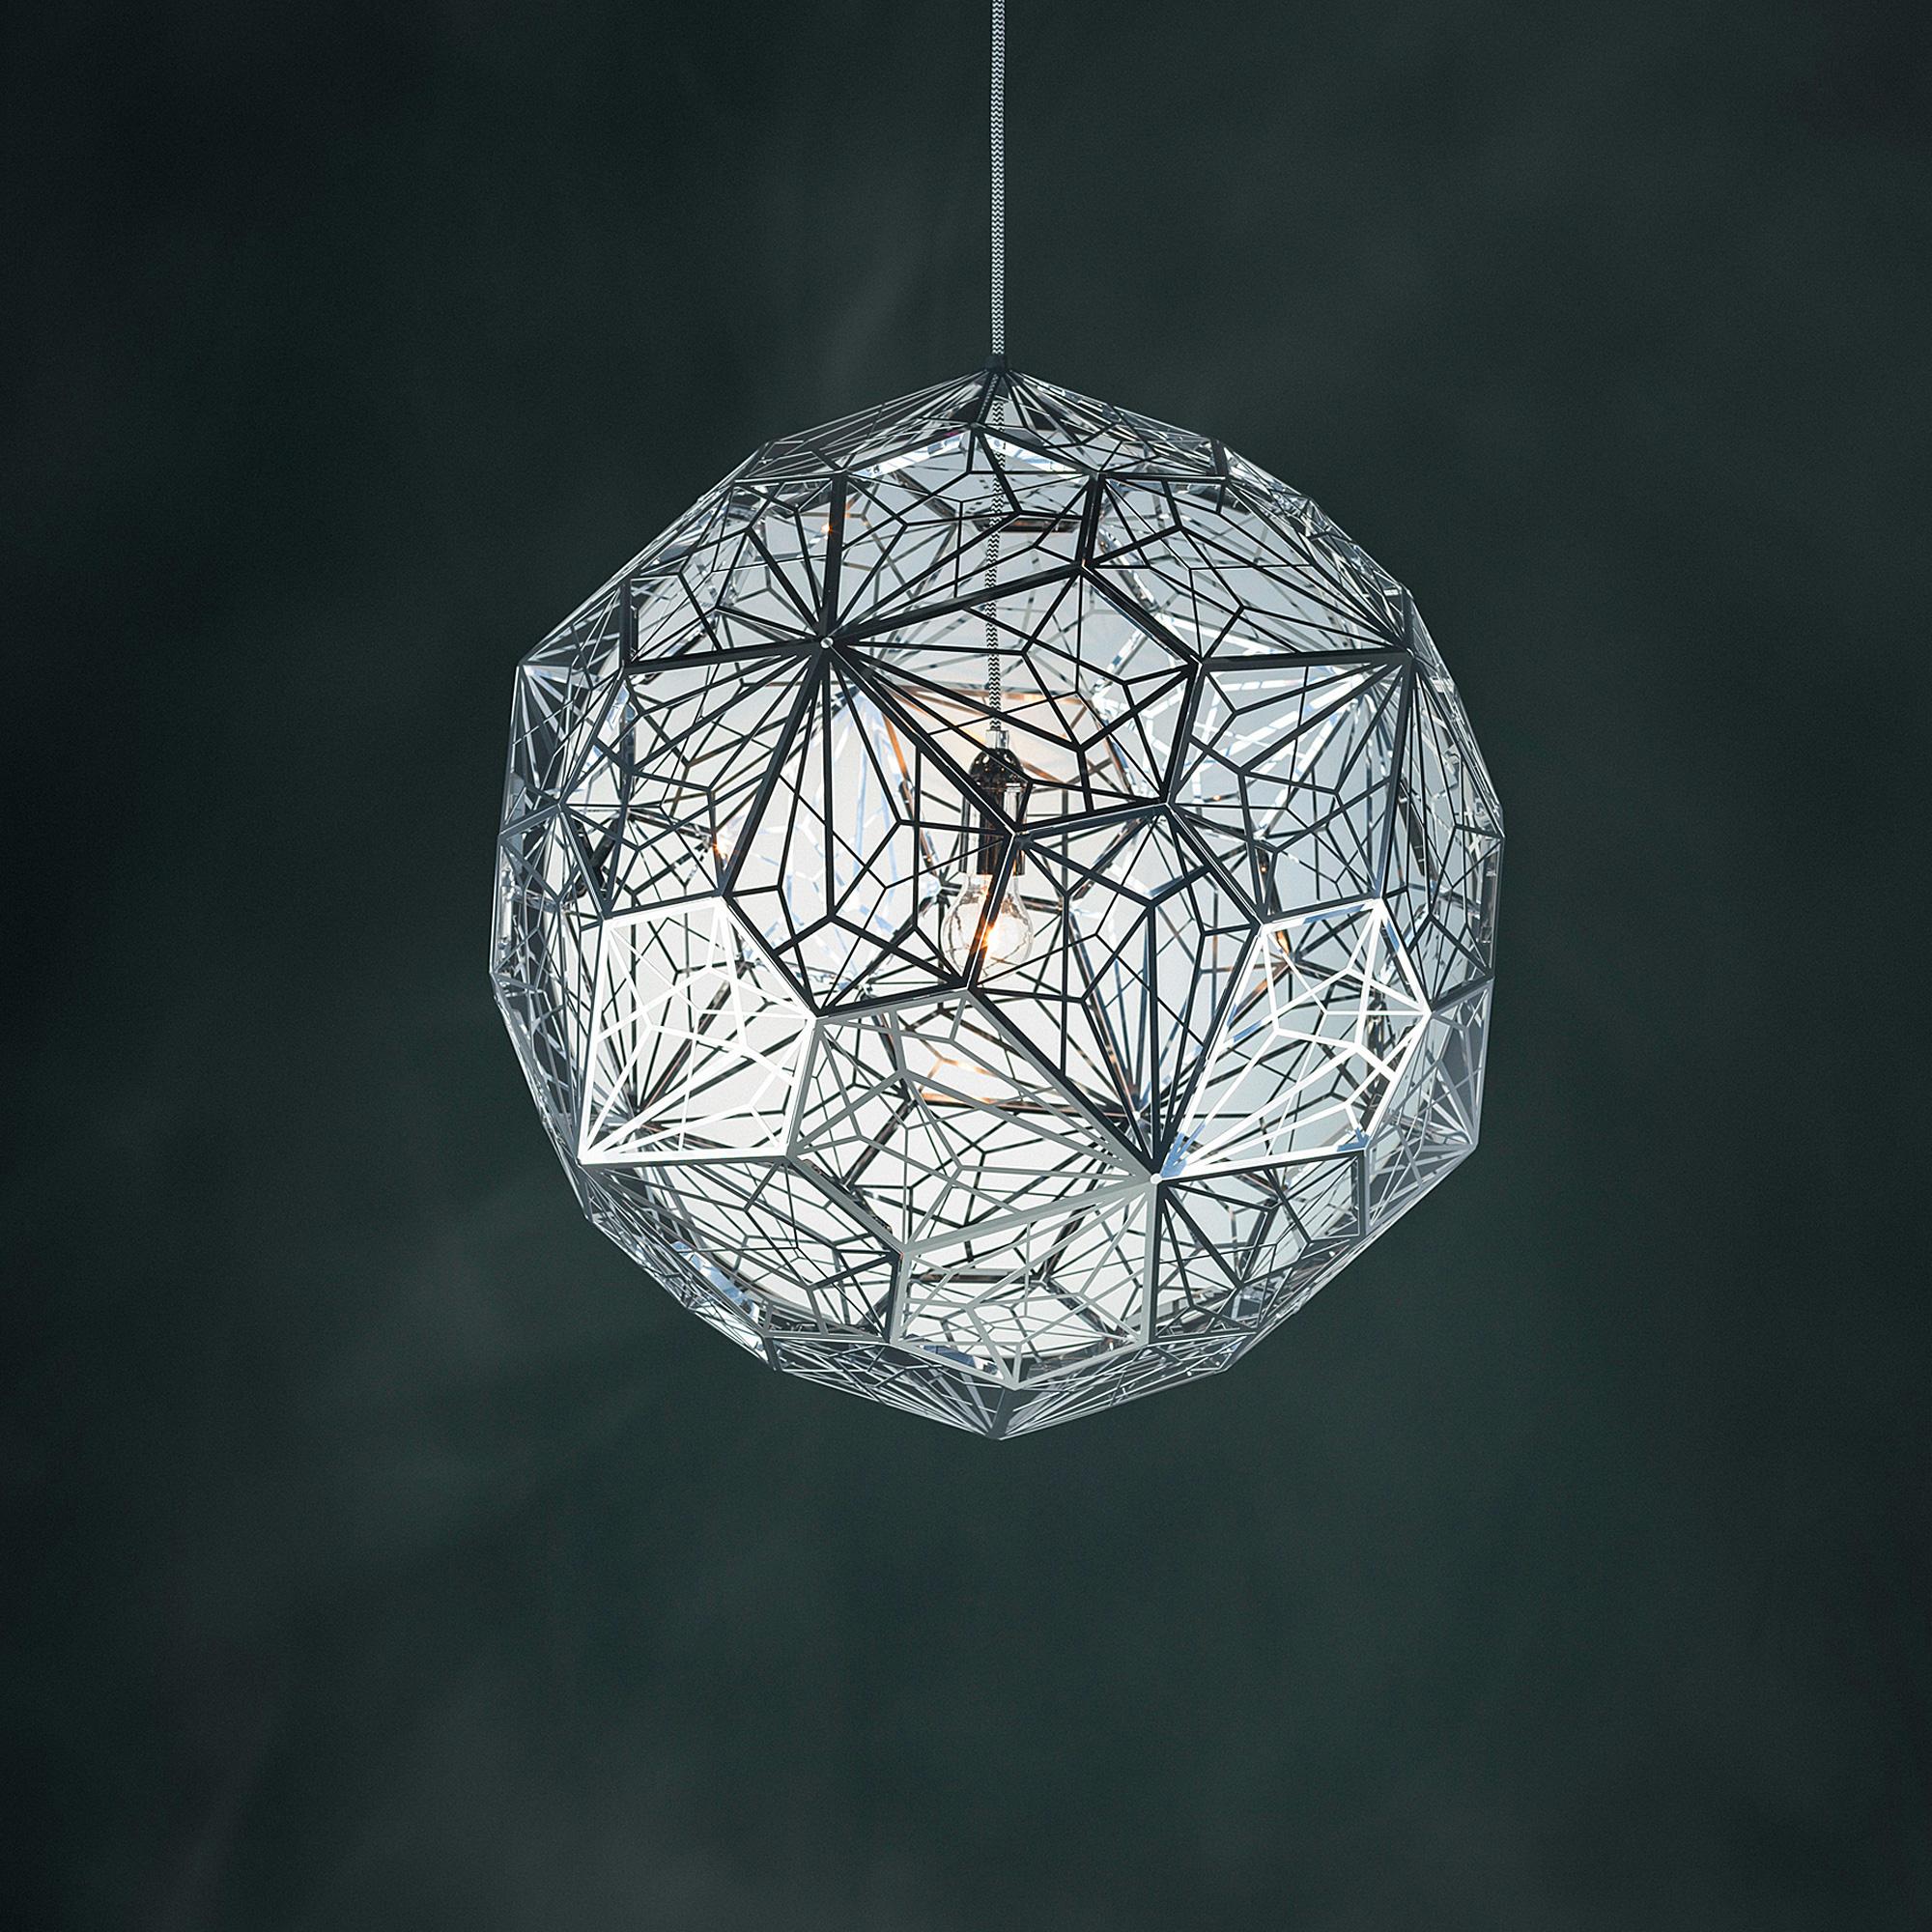 tom dixon etch web steel pendelleuchte 60 cm edelstahl ets01s peum reuter onlineshop. Black Bedroom Furniture Sets. Home Design Ideas